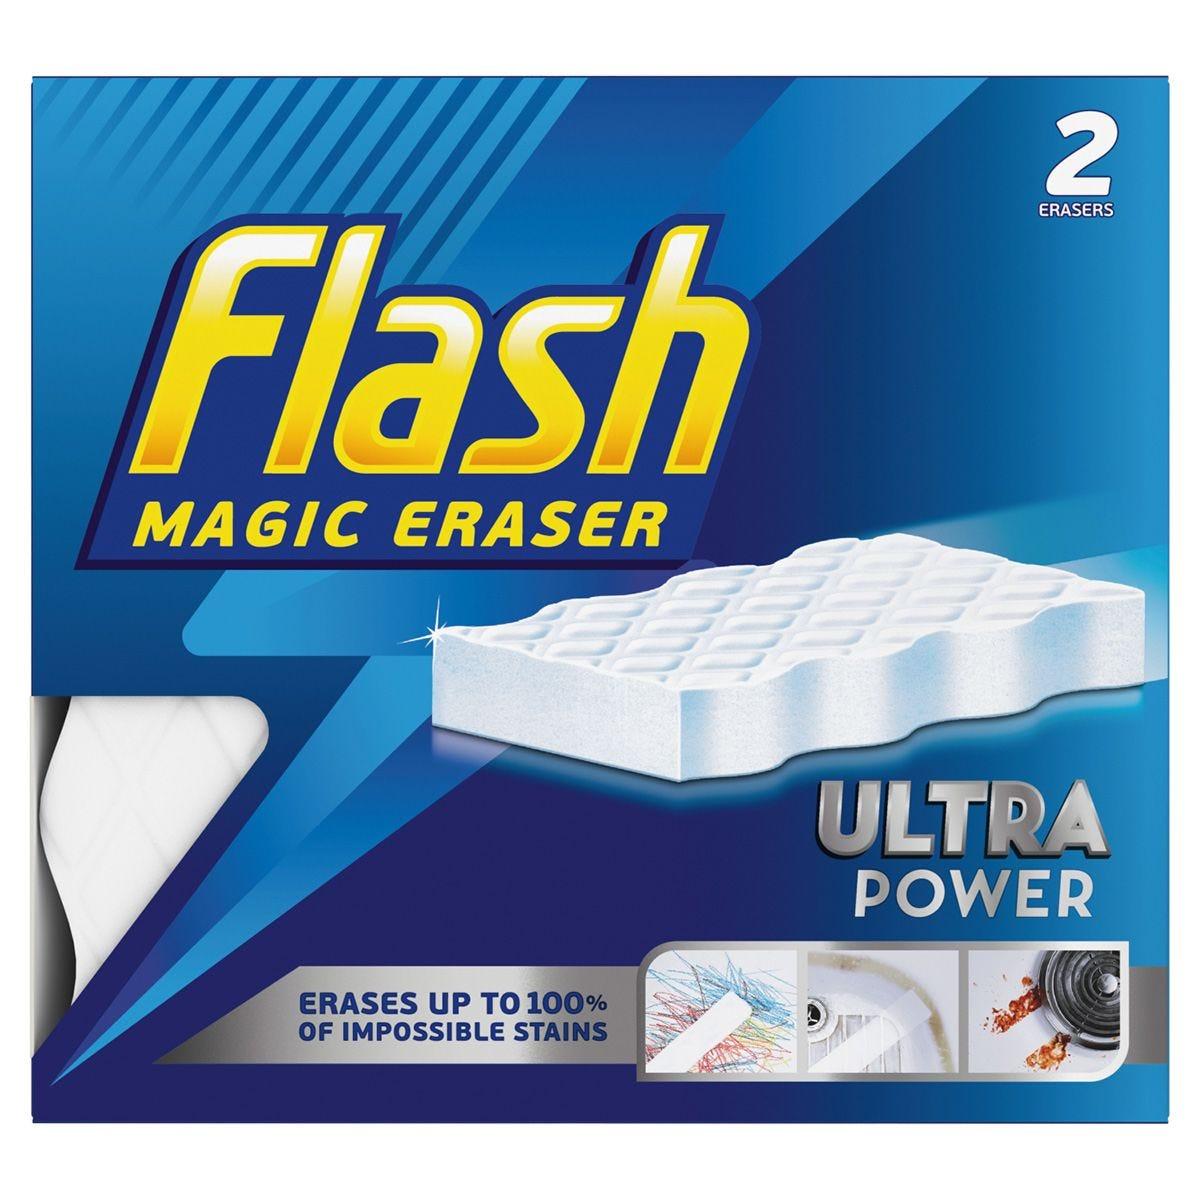 Flash Magic Eraser Extra Power - 2 Pack